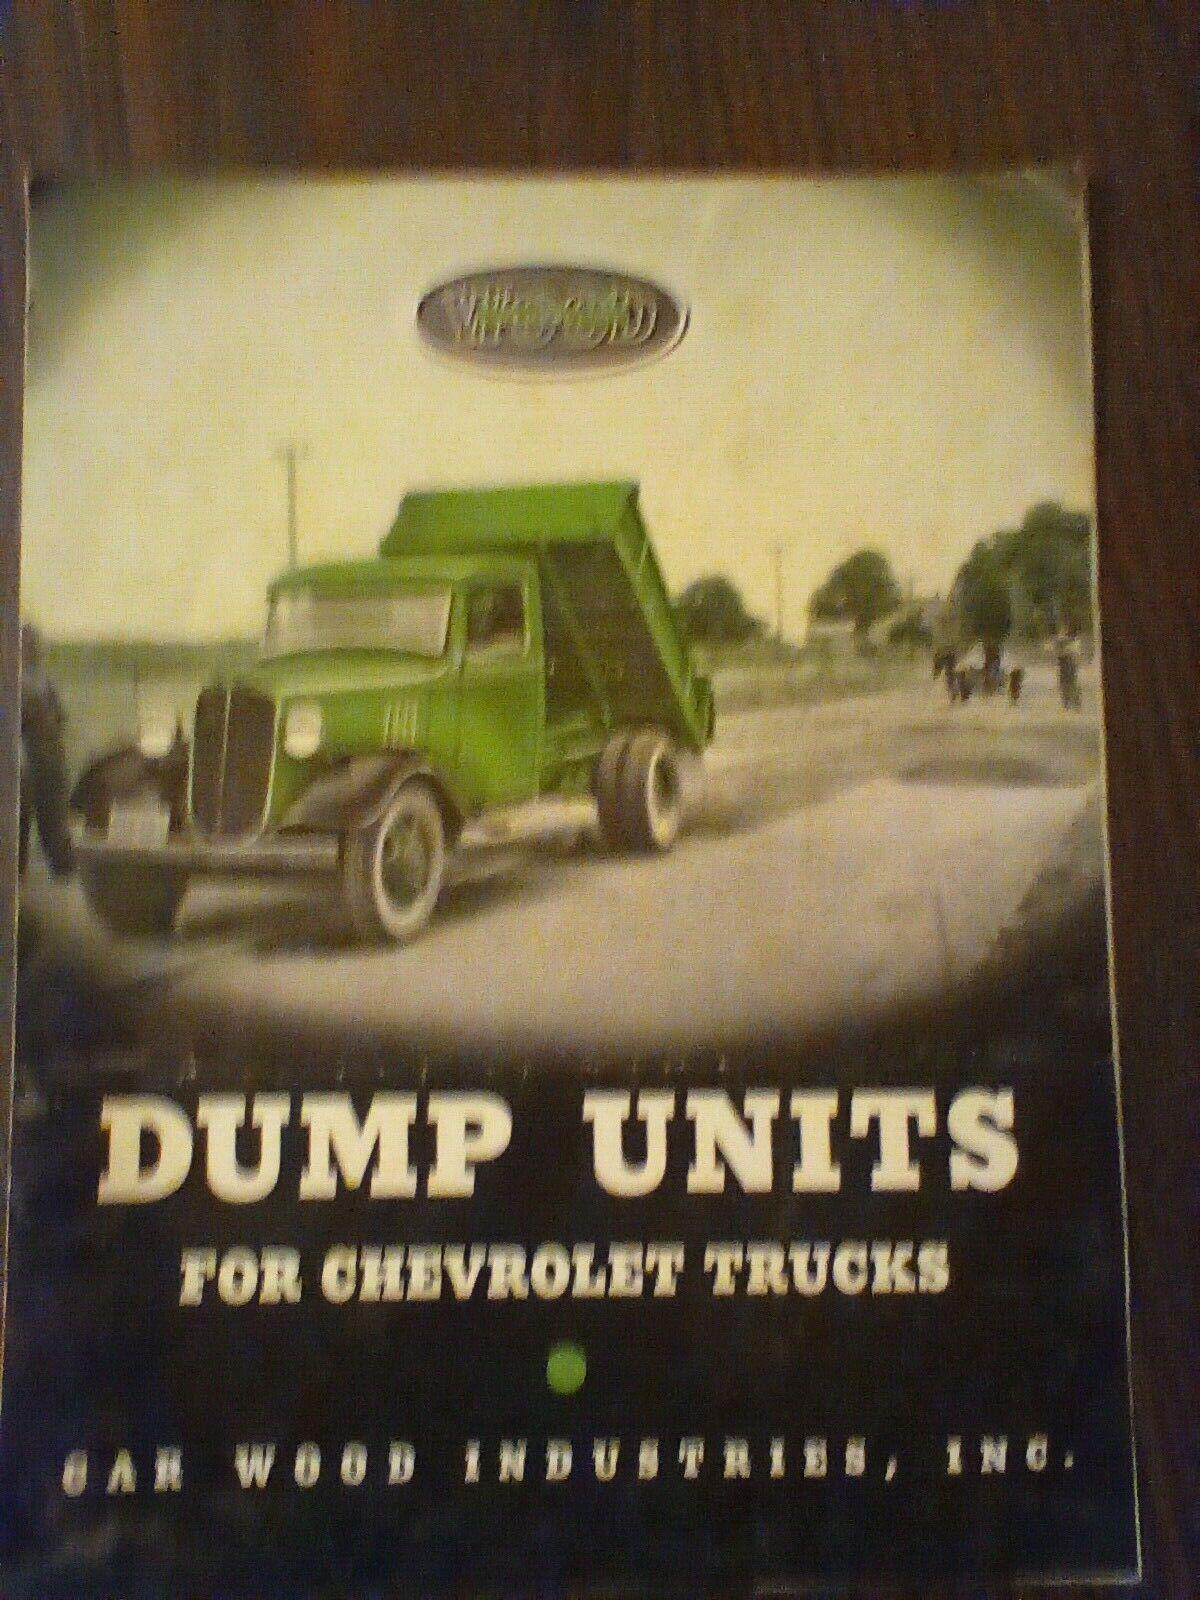 Image 1 - 1935 Wood Hydraulic, Garwood Industries Dump units for chevy trucks catalog